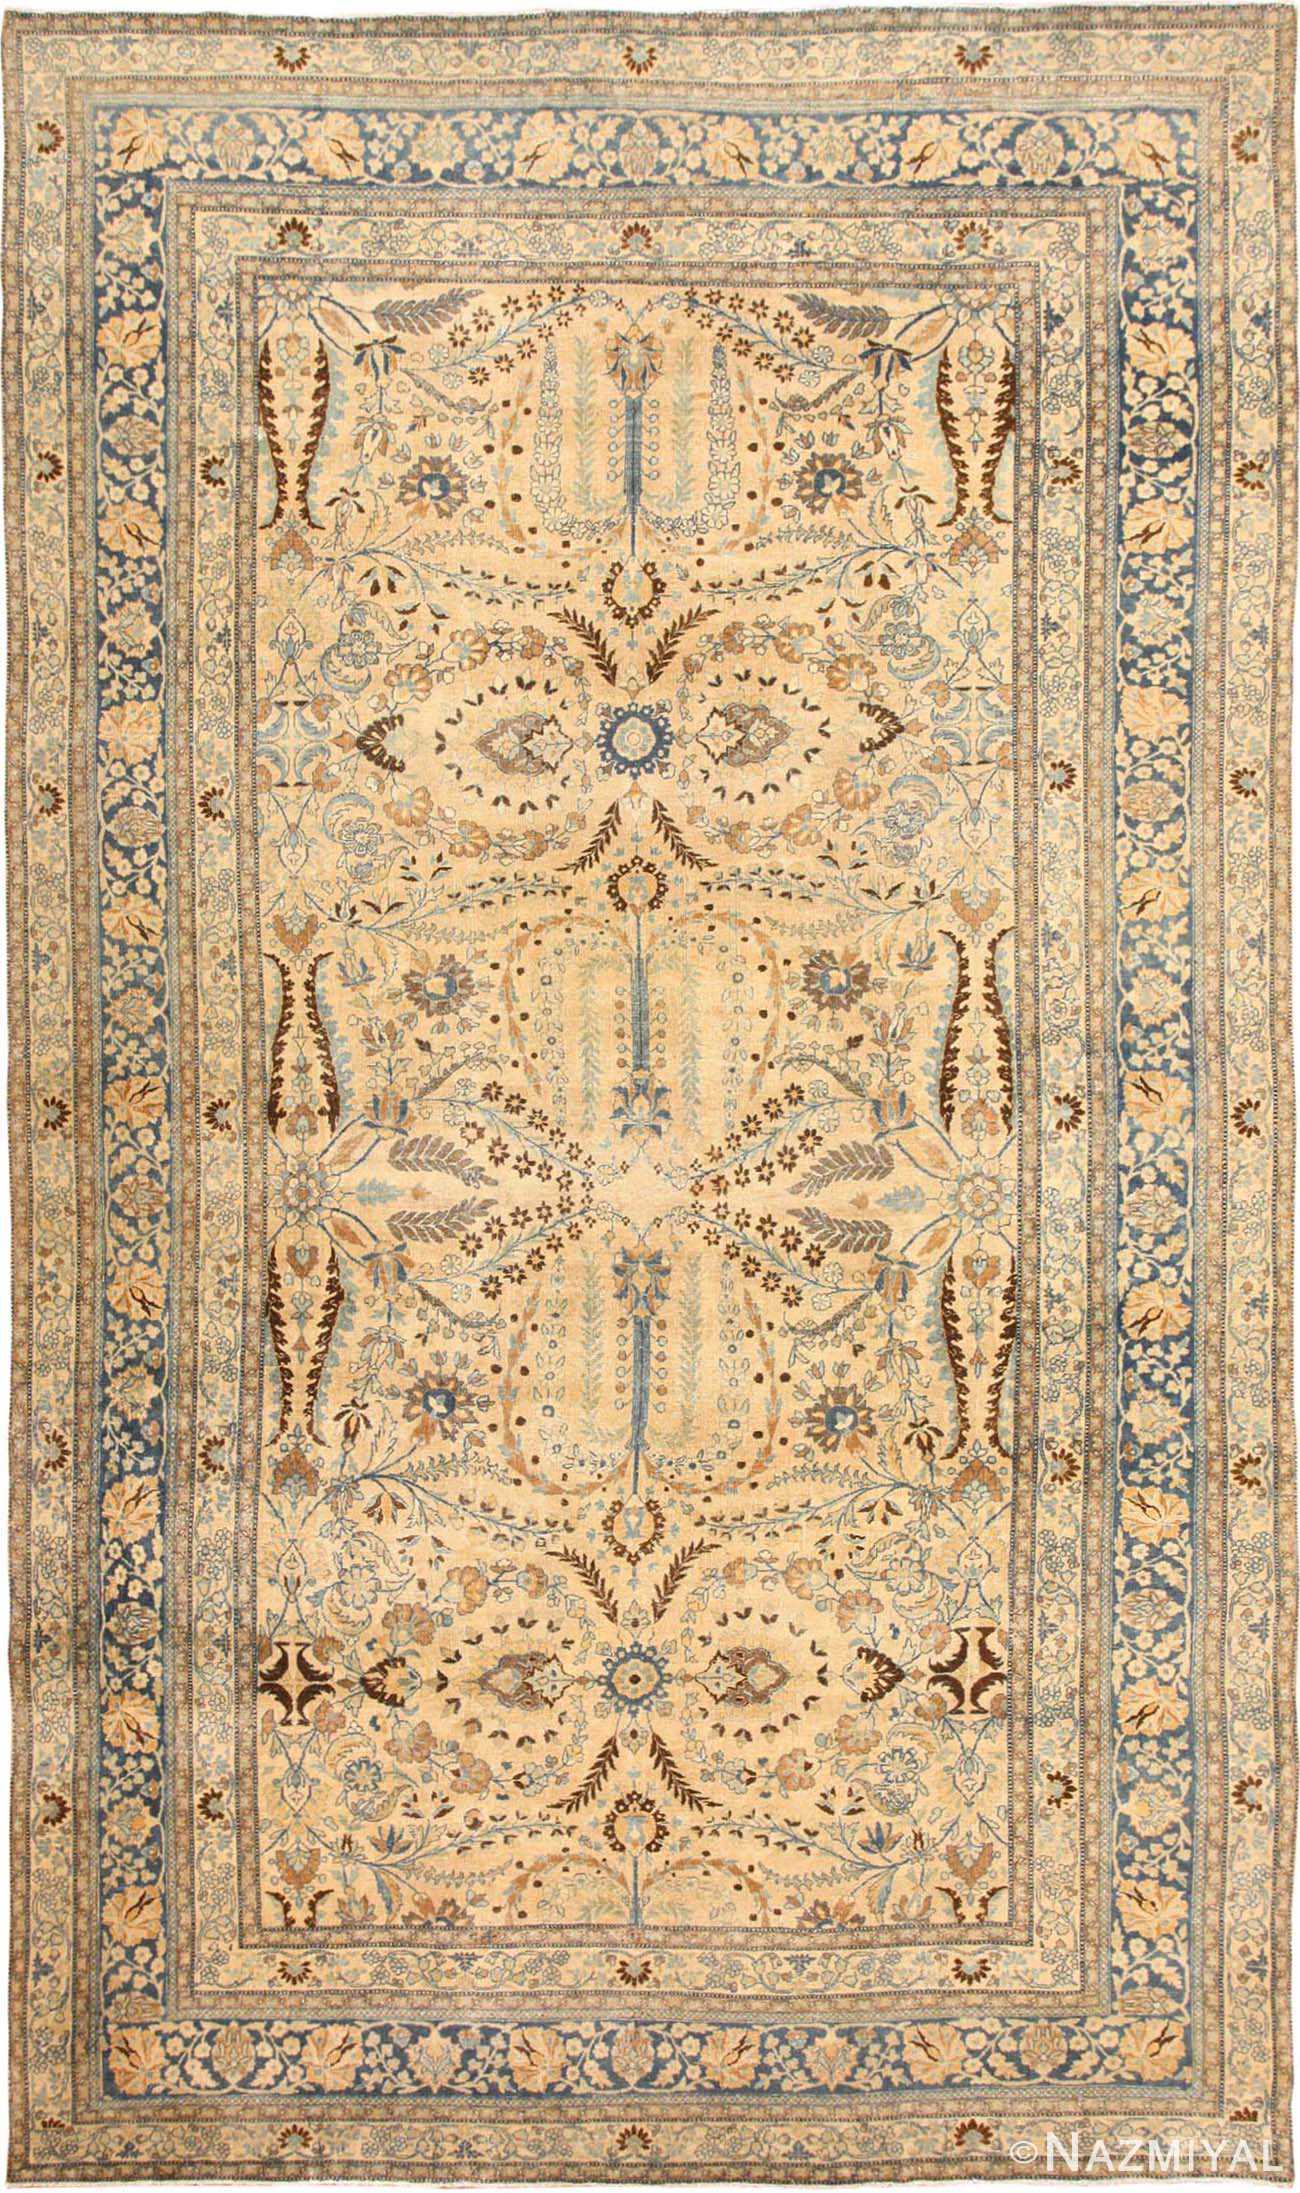 Antique Persian Khorassan Rug 48788